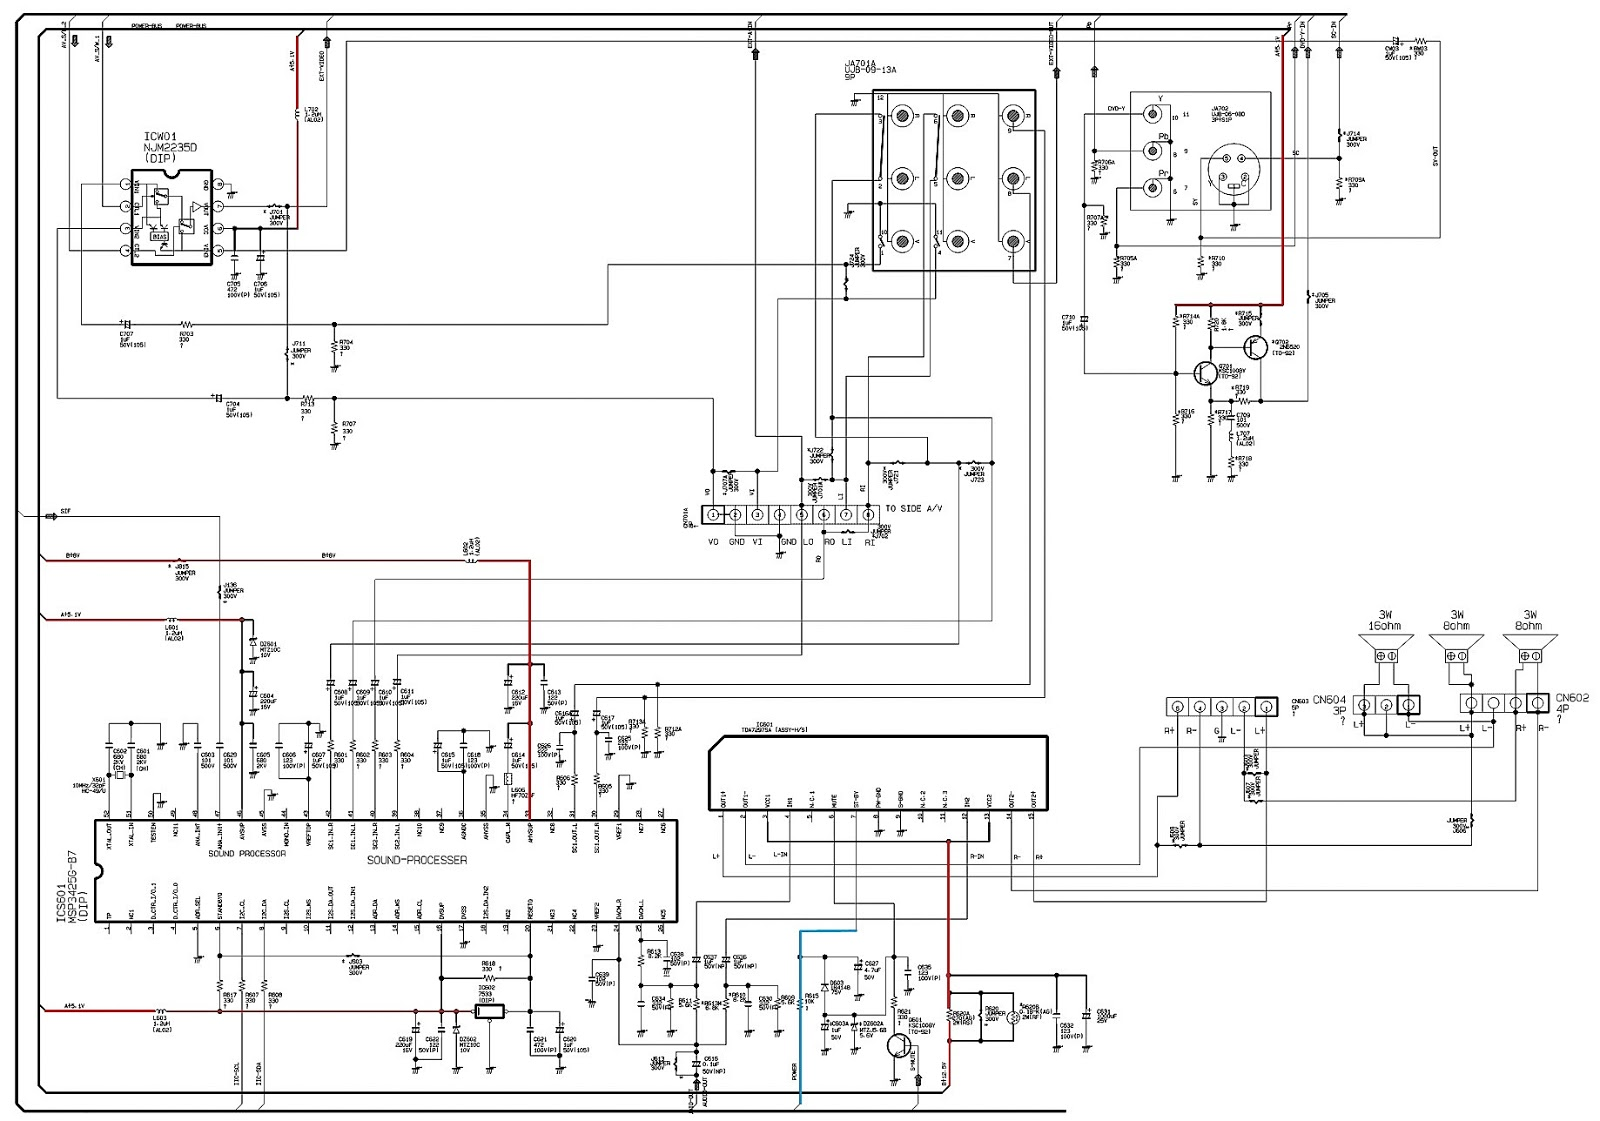 Tv Tuner Card Circuit Diagram Yamaha Banshee Drag Wiring  The